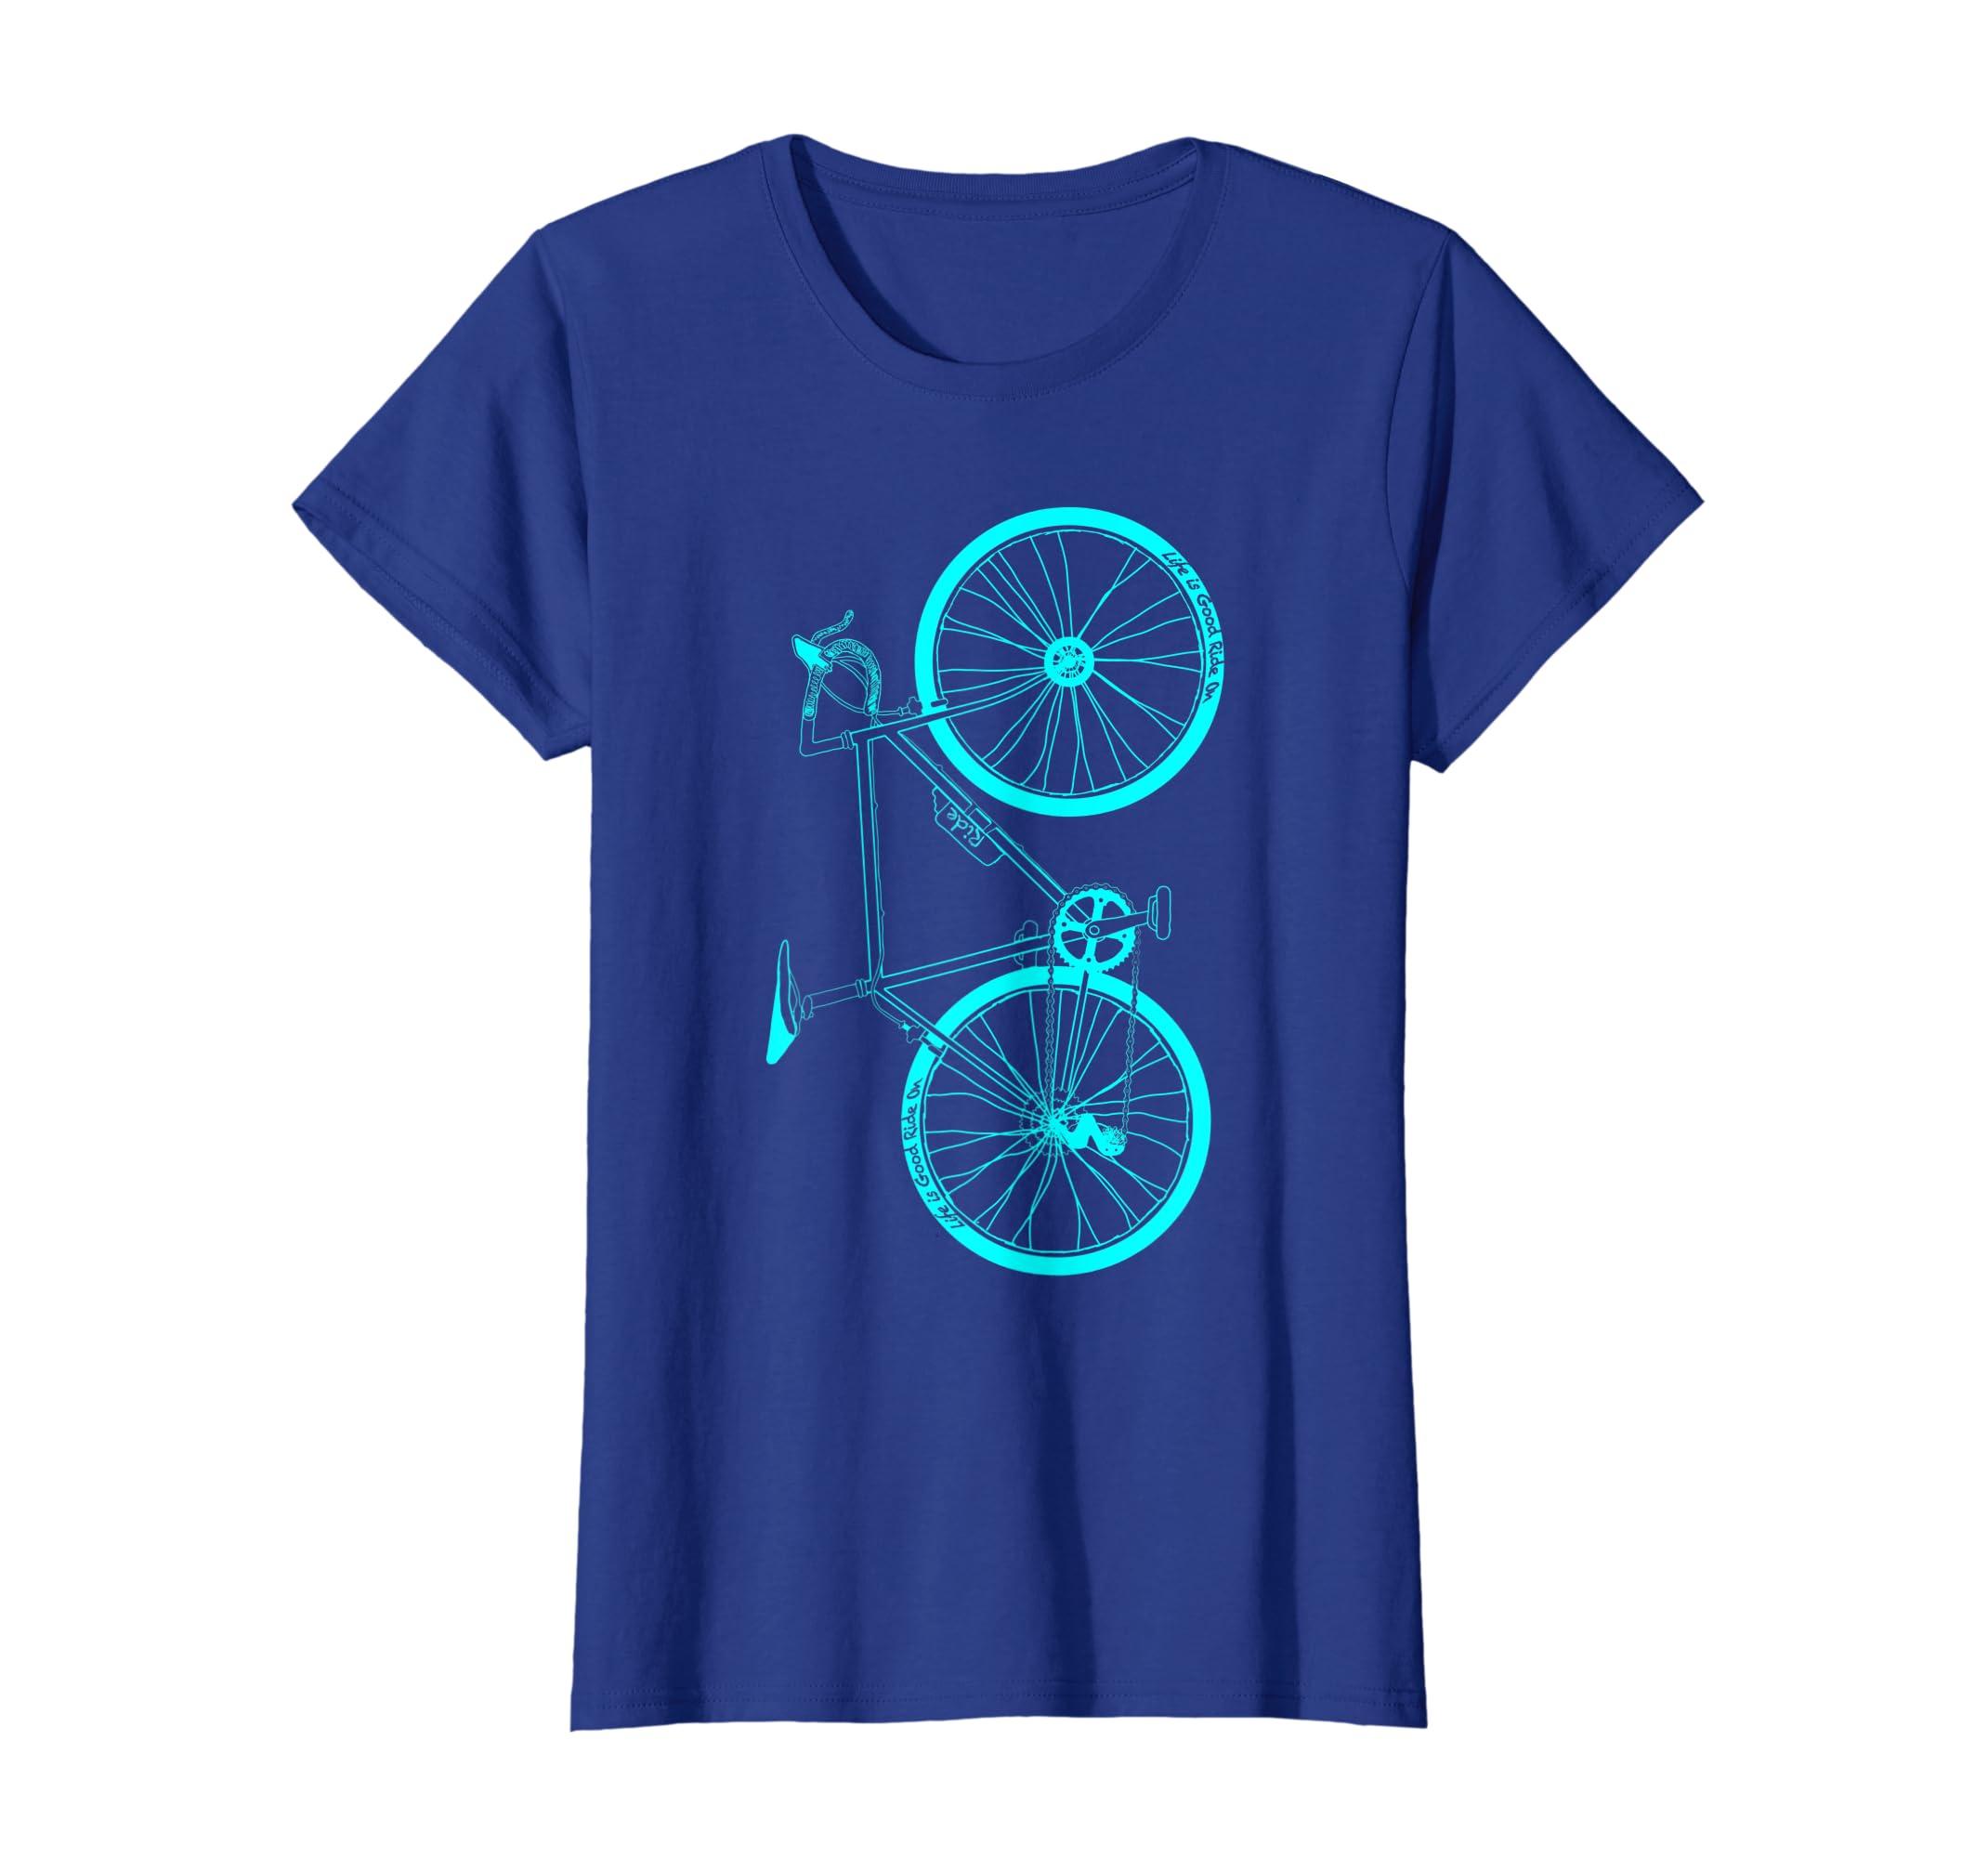 32921635280 Amazon.com  Life Is Good Ride On Bike Cycling   Triathlon T-shirt Gift   Clothing